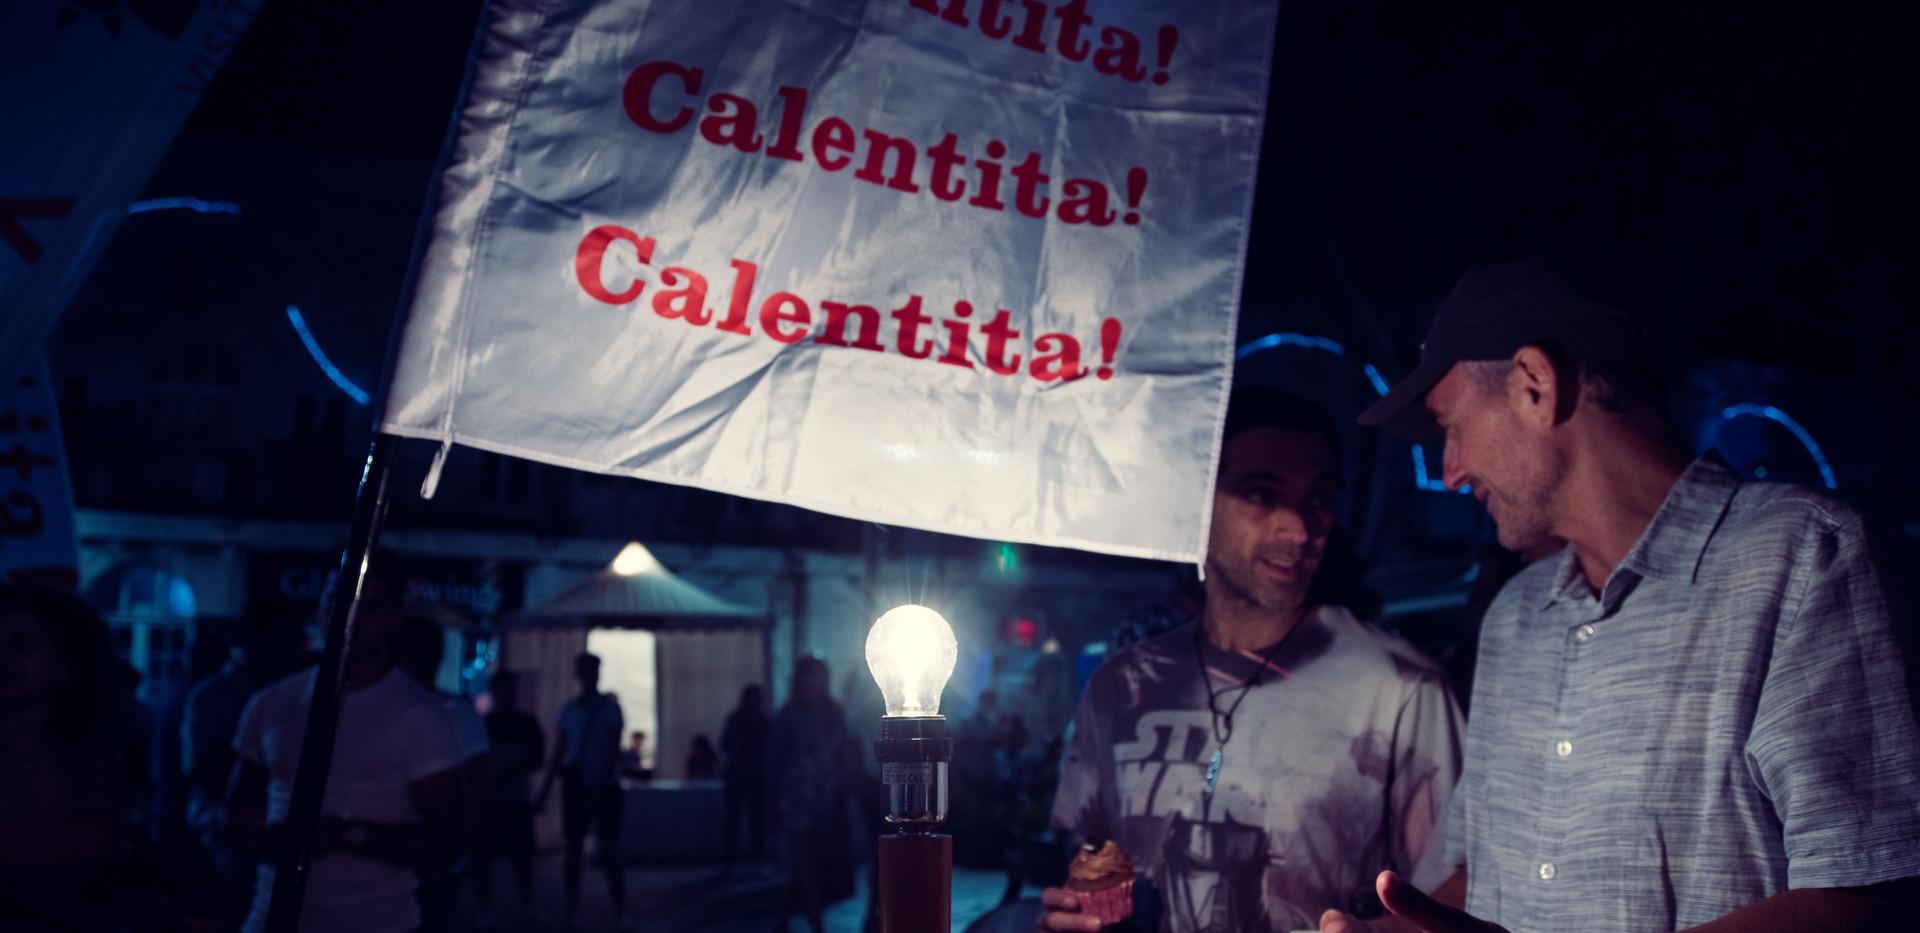 calentita_2018-039.jpg